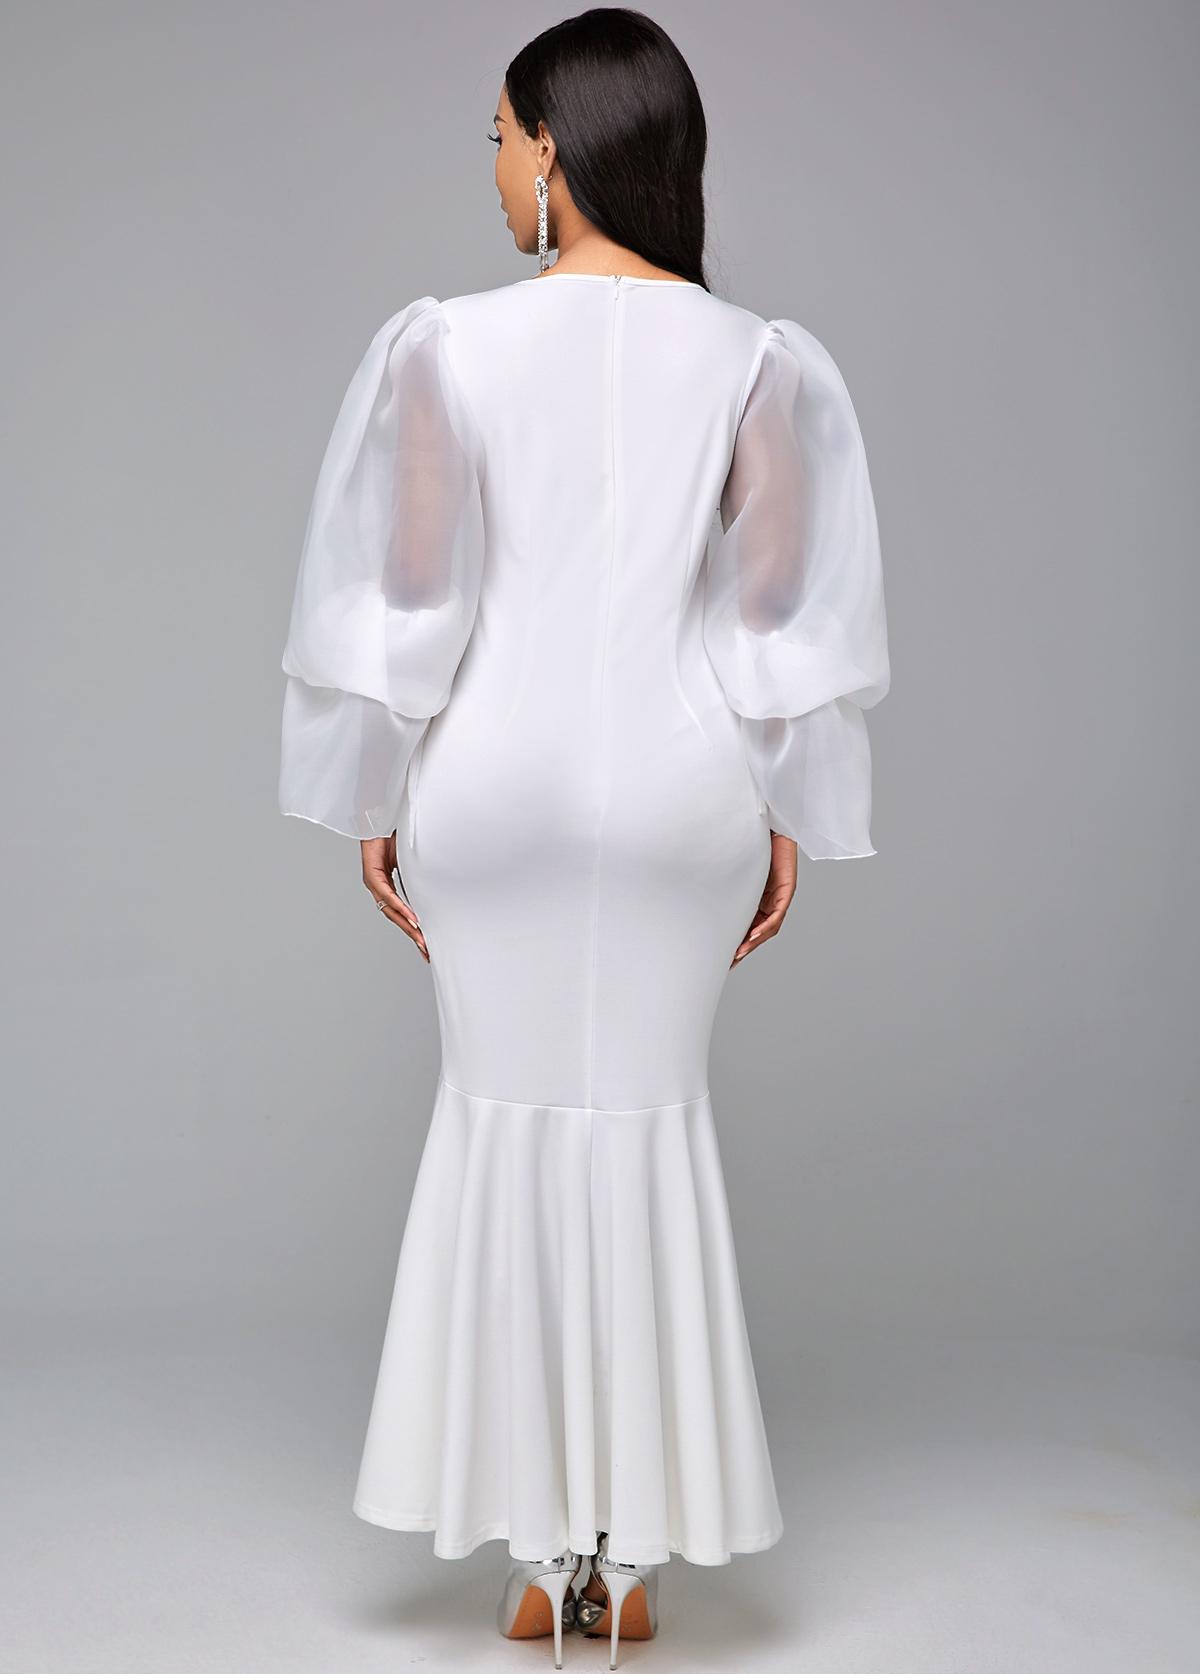 Long Sleeve White Round Neck Mermaid Dress